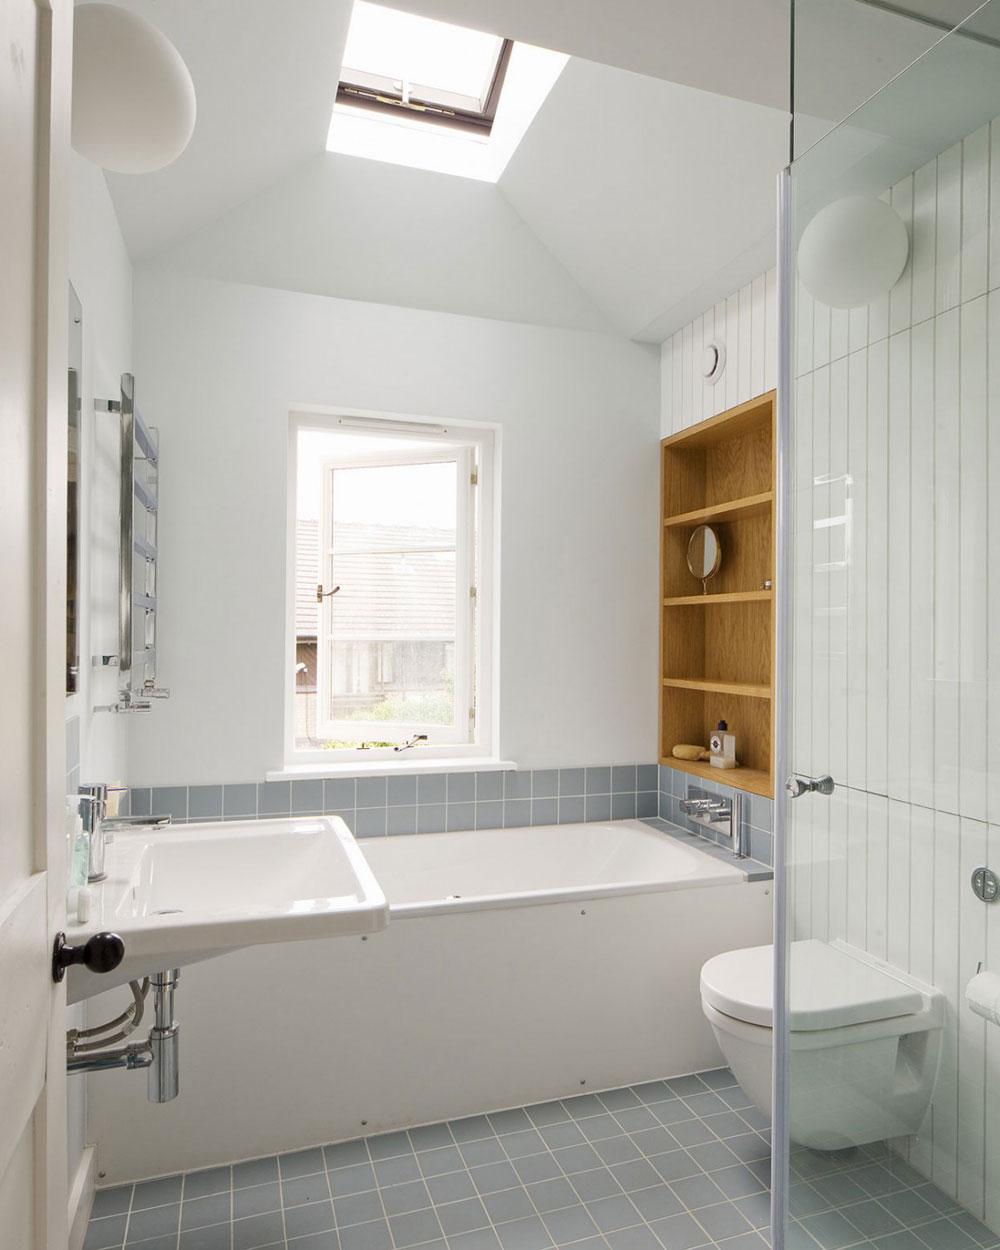 Bathroom-Interior-Design-Pictures-7 Bathroom-Interior-Design-Pictures available to inspire you